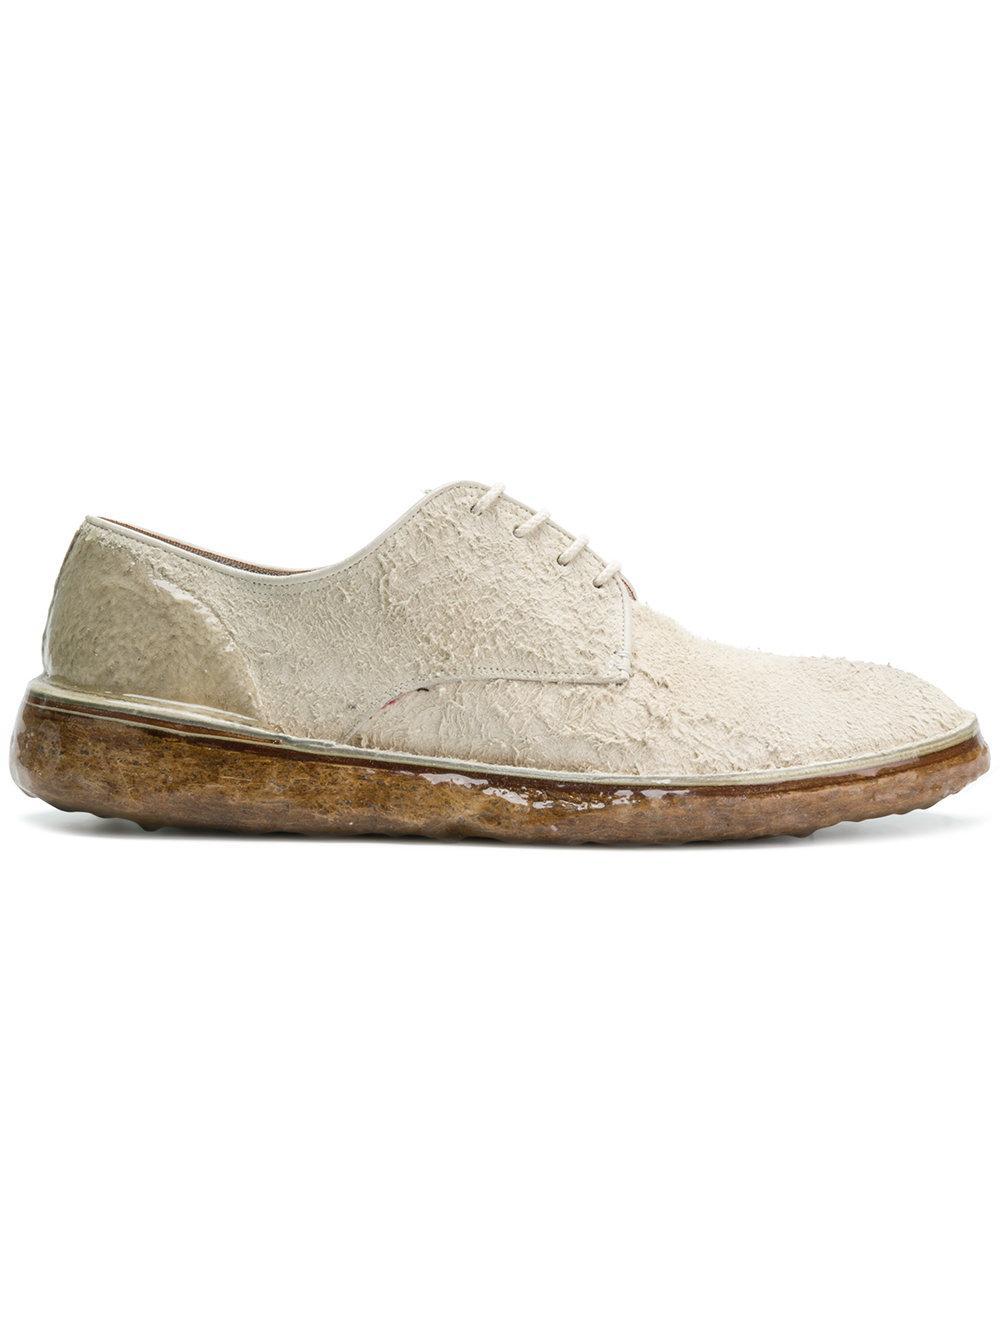 Premiata Textured Lace-up Shoes - Nude & Neutrals